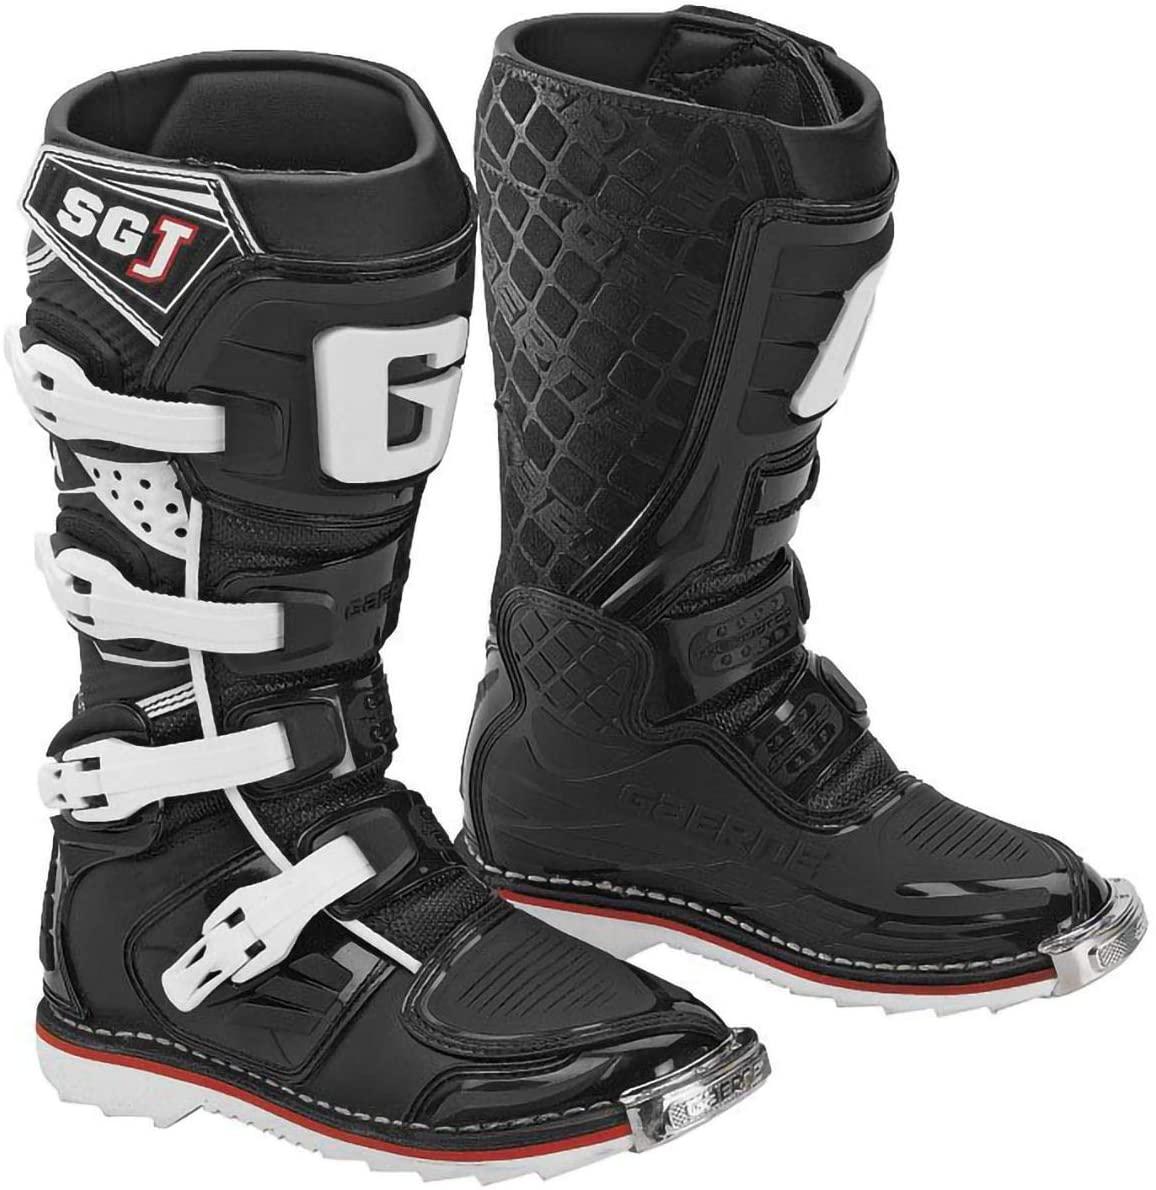 Gaerne Youth SG-J Boots (2) (Black)